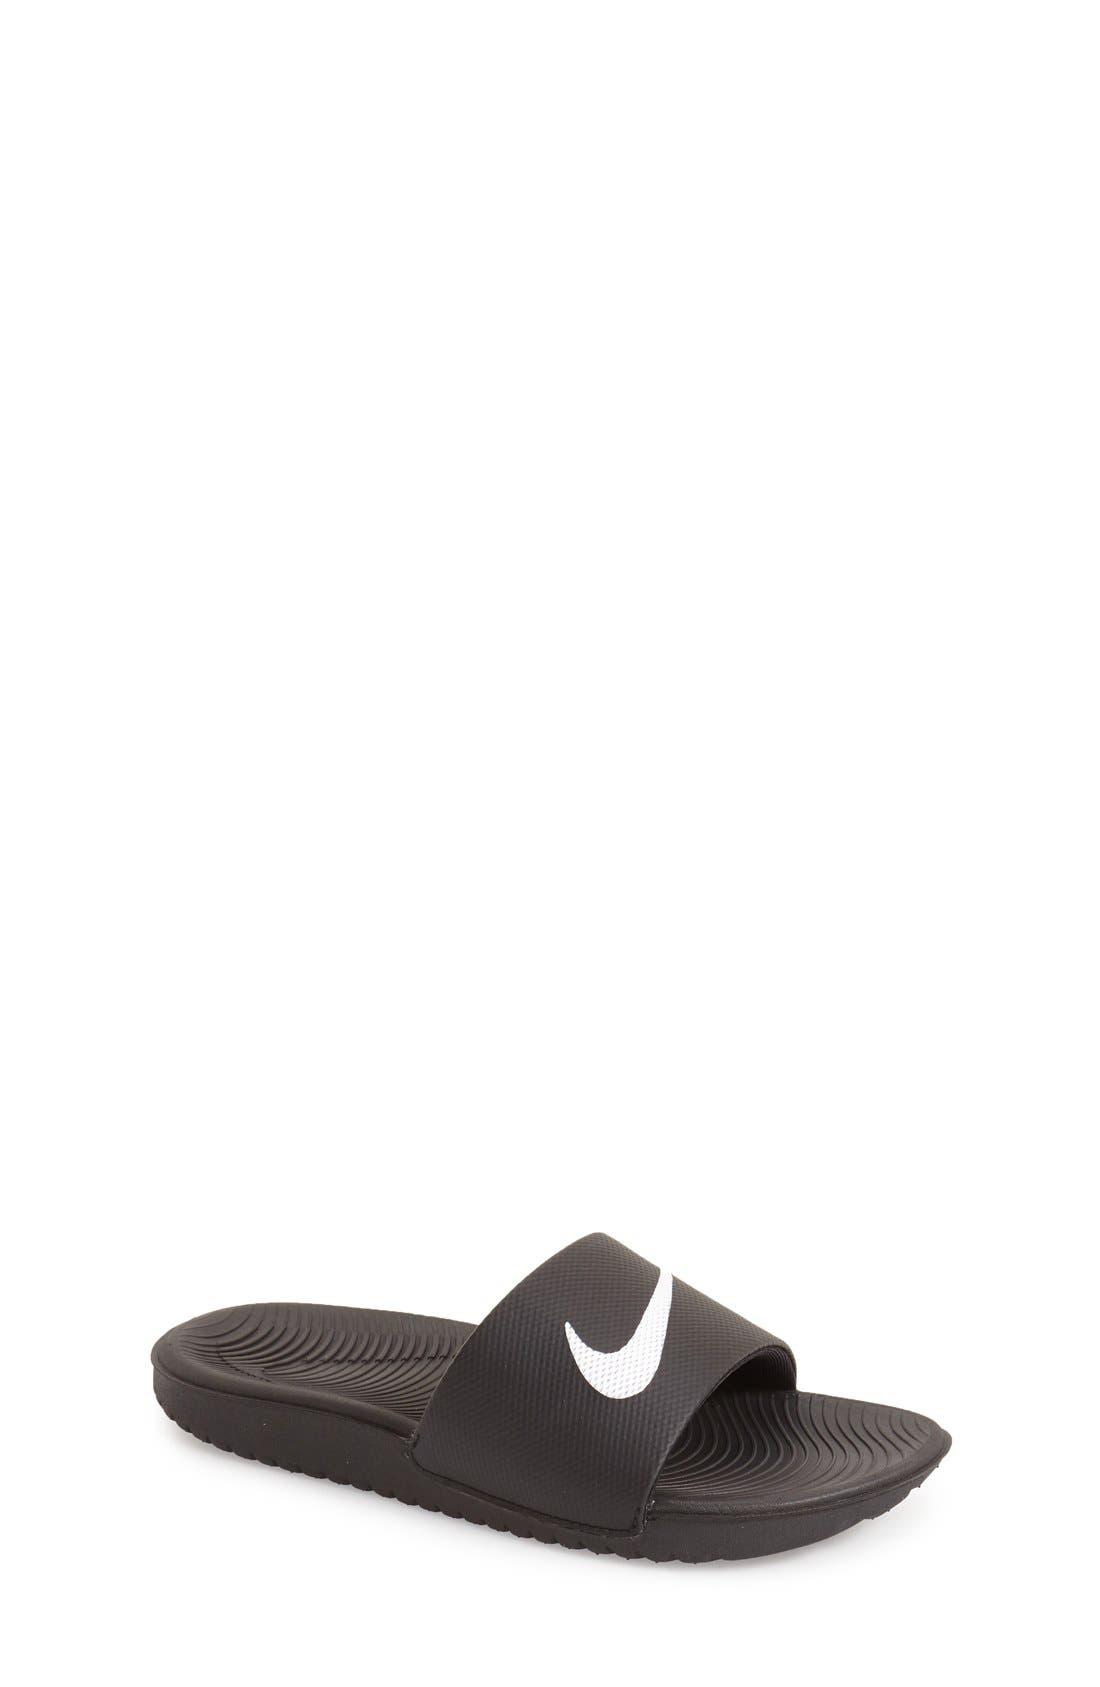 'Kawa' Slide Sandal,                         Main,                         color, BLACK/ WHITE